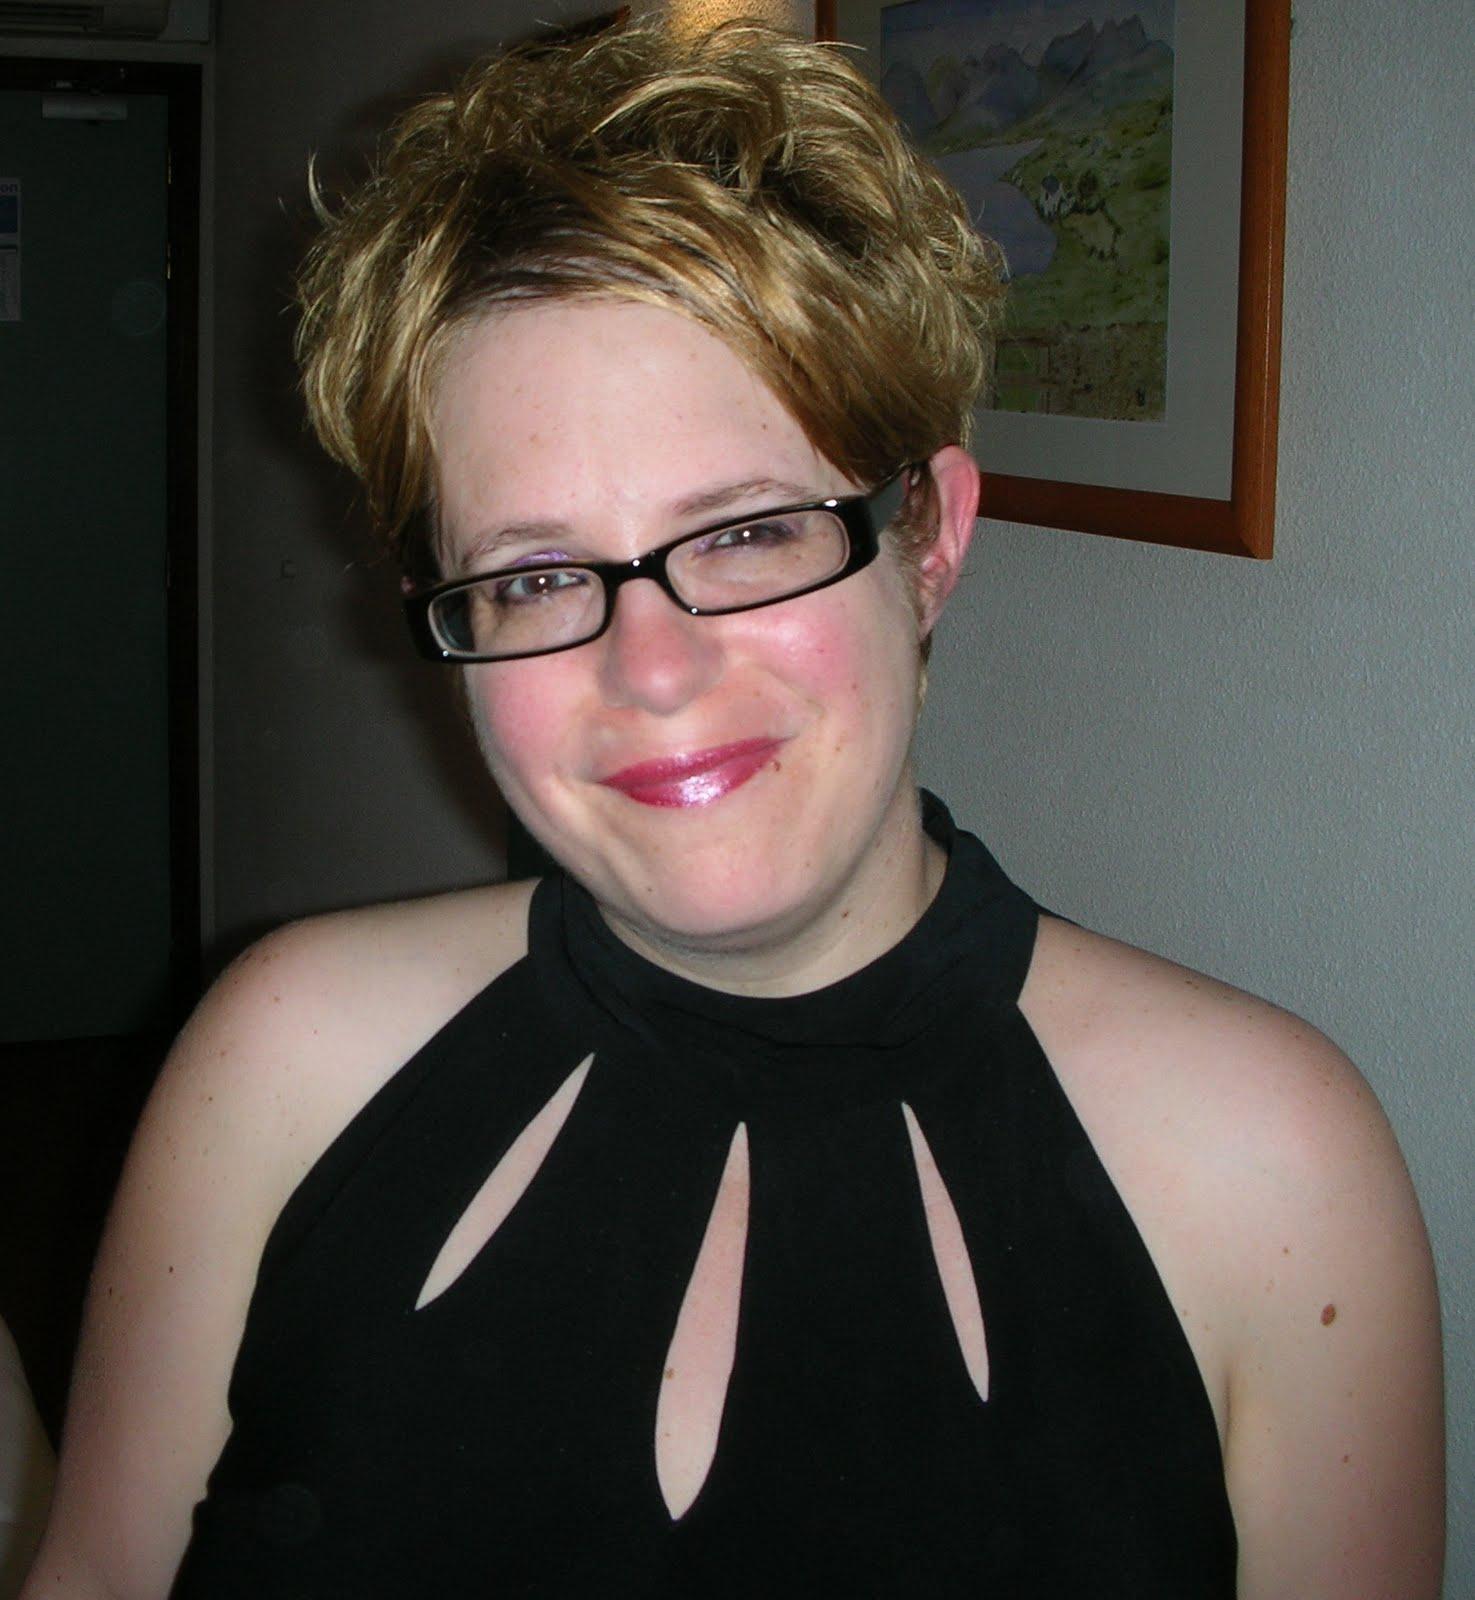 Mandy Baggot